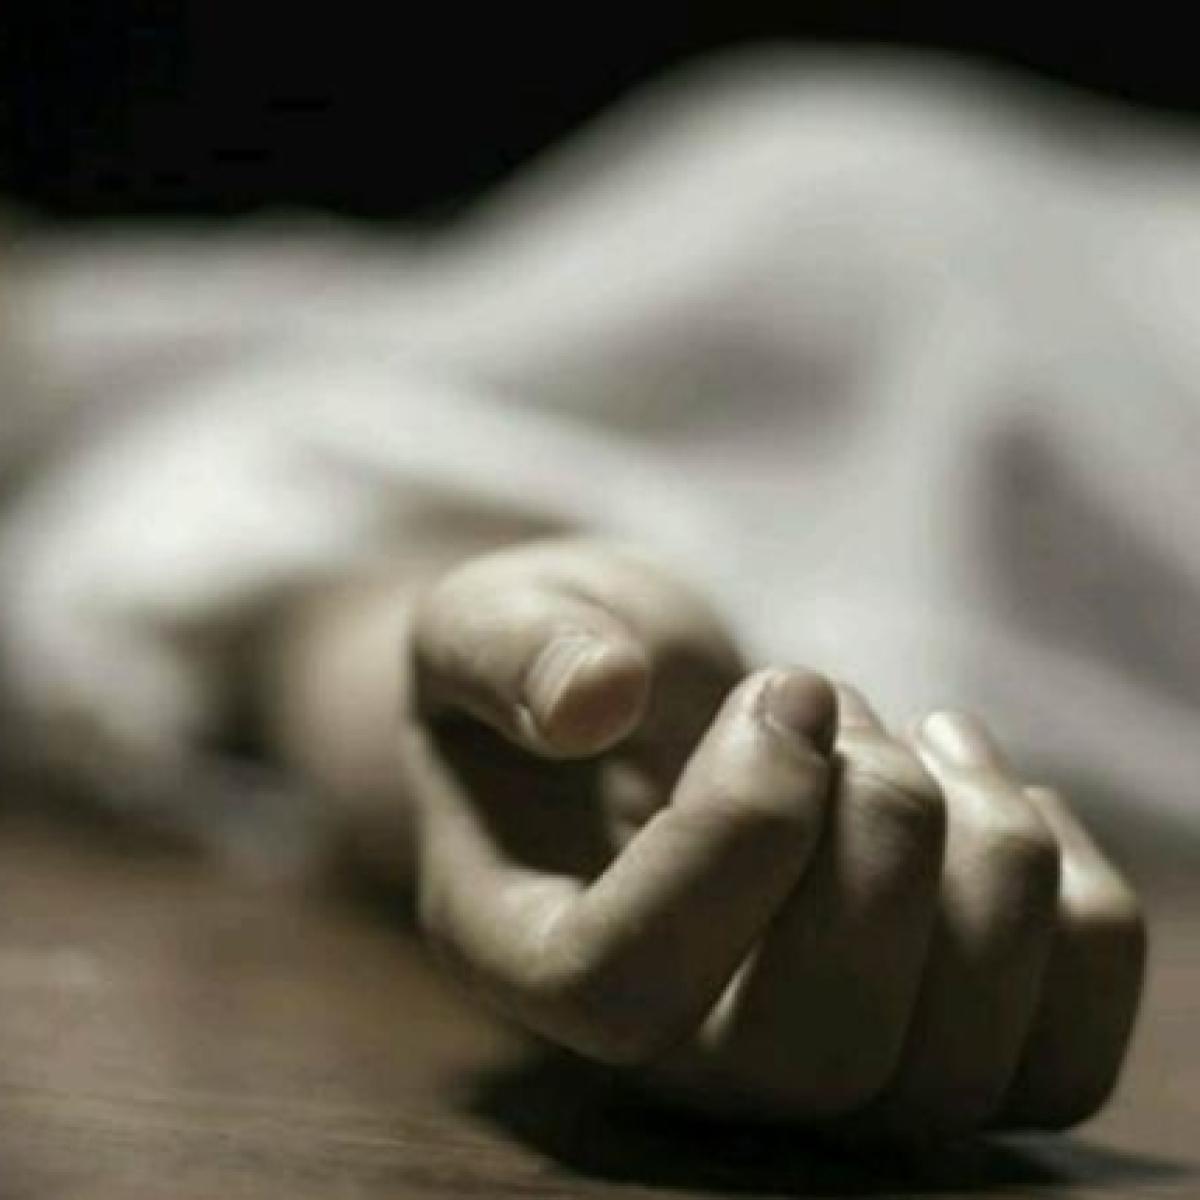 Uttar Pradesh: 64-year-old retired Army officer thrashed to death in Amethi